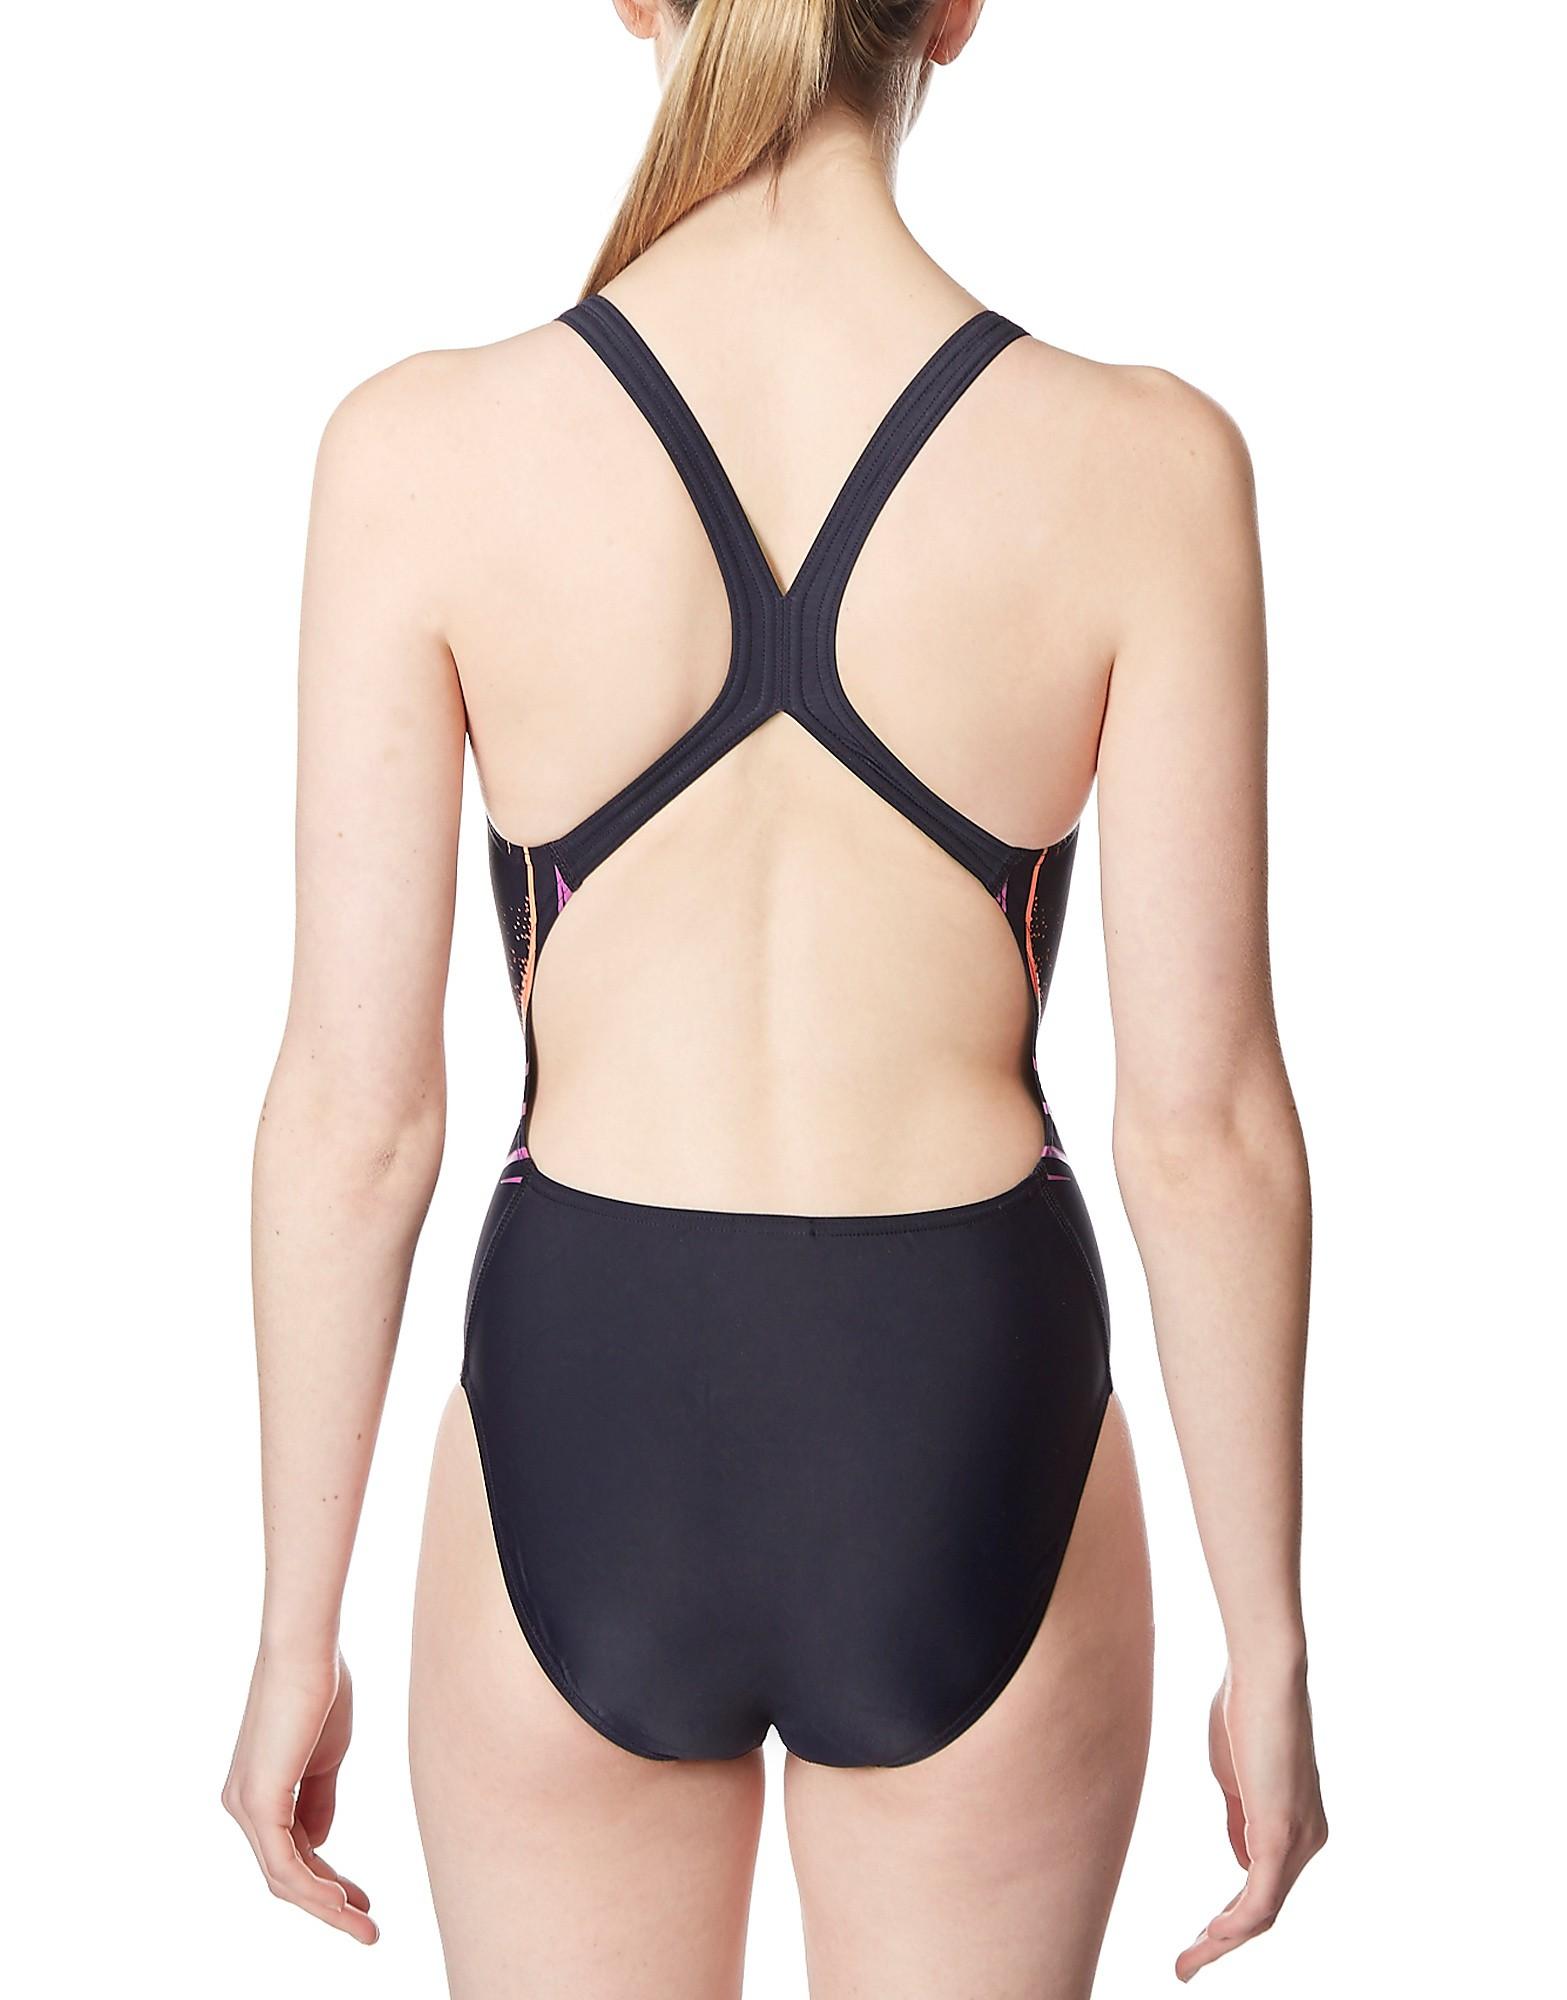 Speedo Placement Powerback Printed 7 Swimsuit